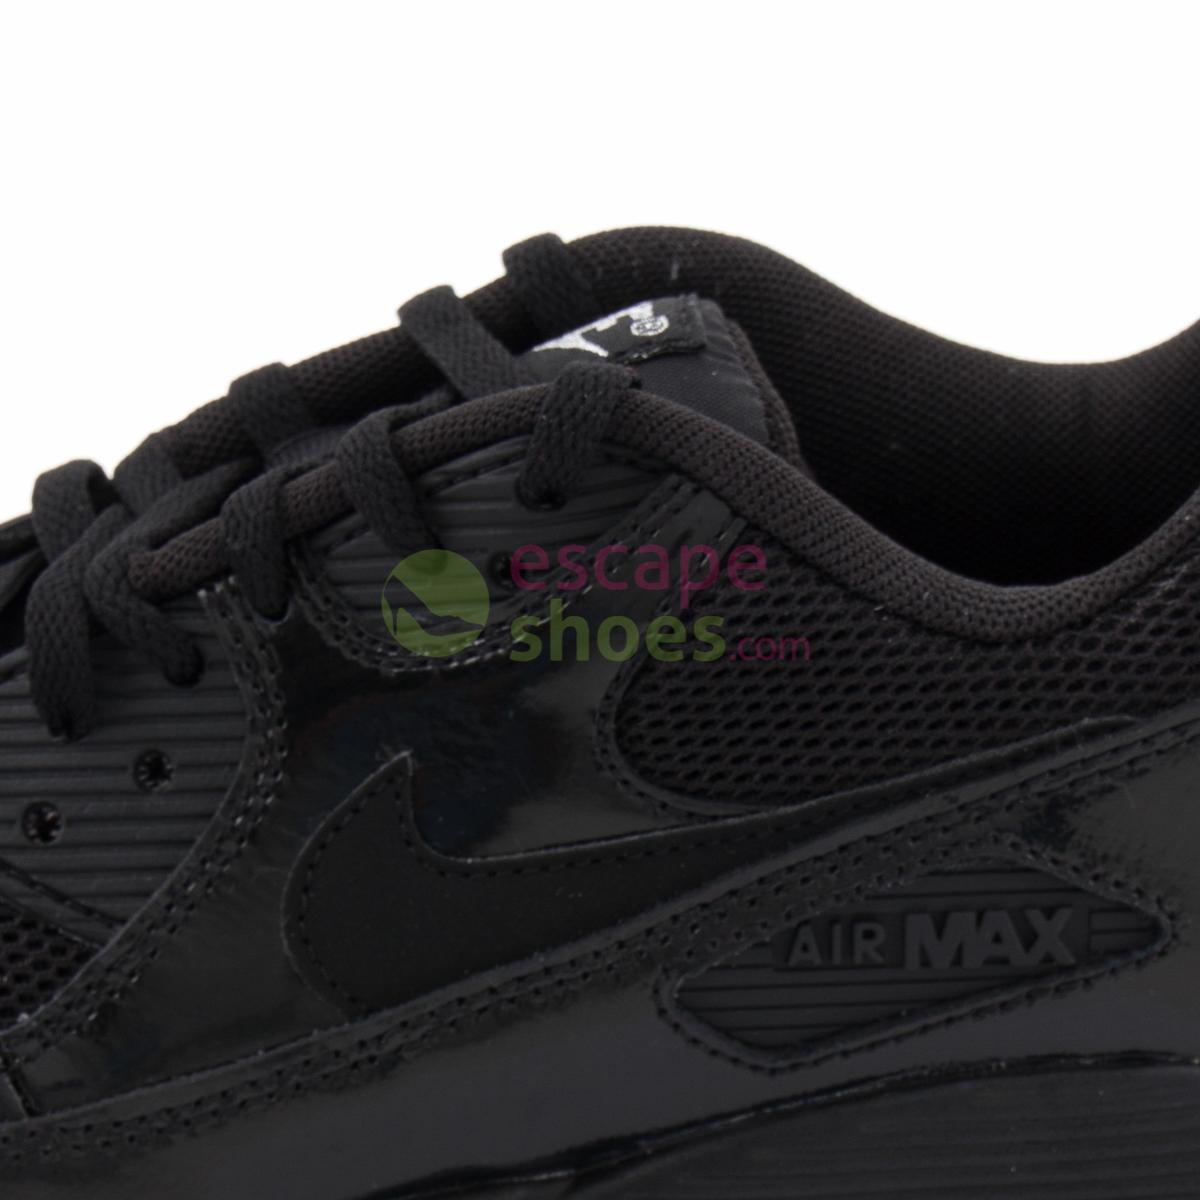 Sneakers NIKE Wmns Air Max 90 Prem Black Metallic Silver